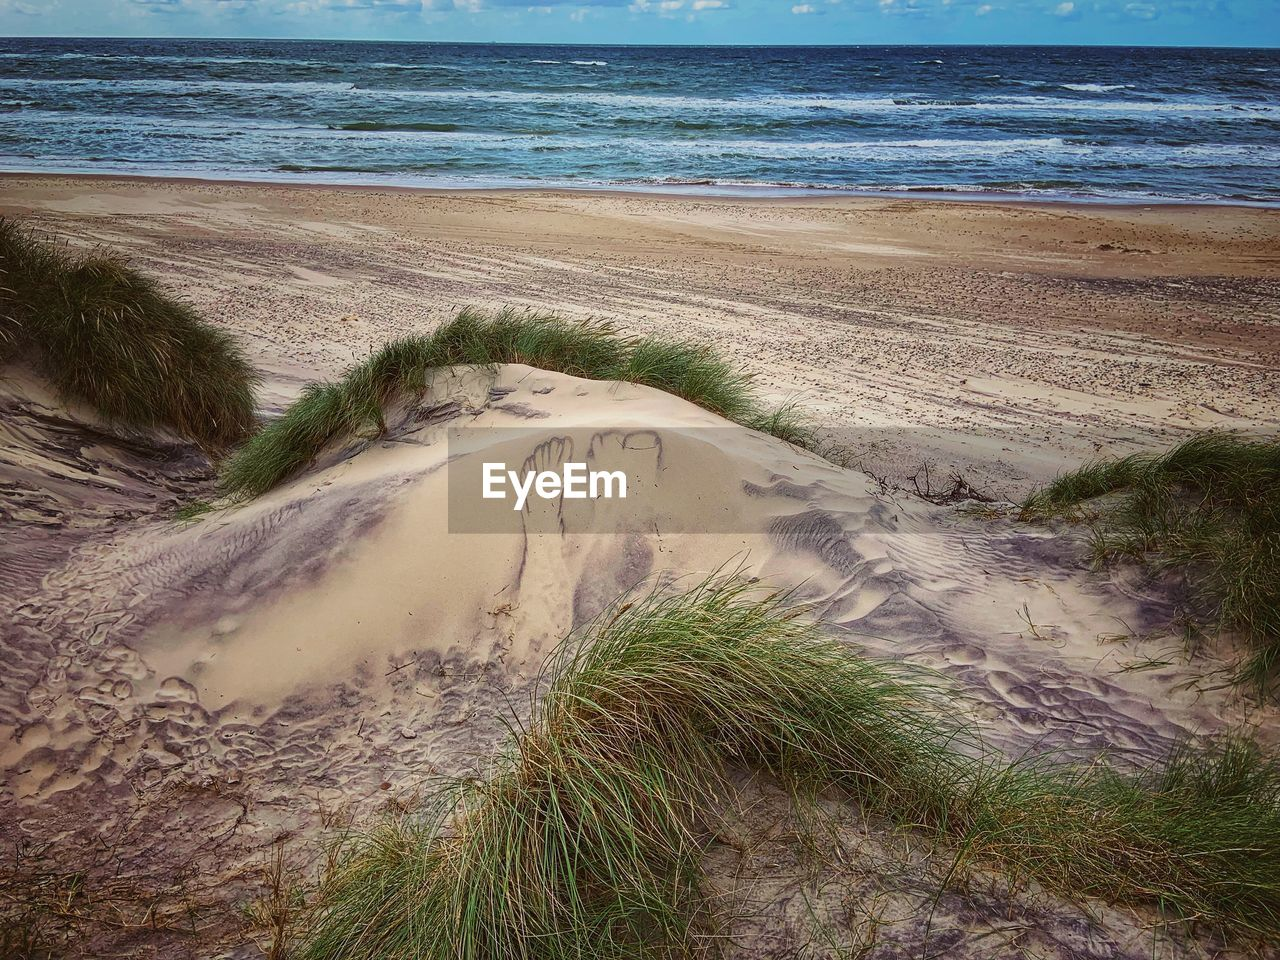 water, sea, land, beach, beauty in nature, sand, scenics - nature, tranquility, plant, nature, tranquil scene, day, no people, sky, horizon, horizon over water, grass, wave, idyllic, outdoors, marram grass